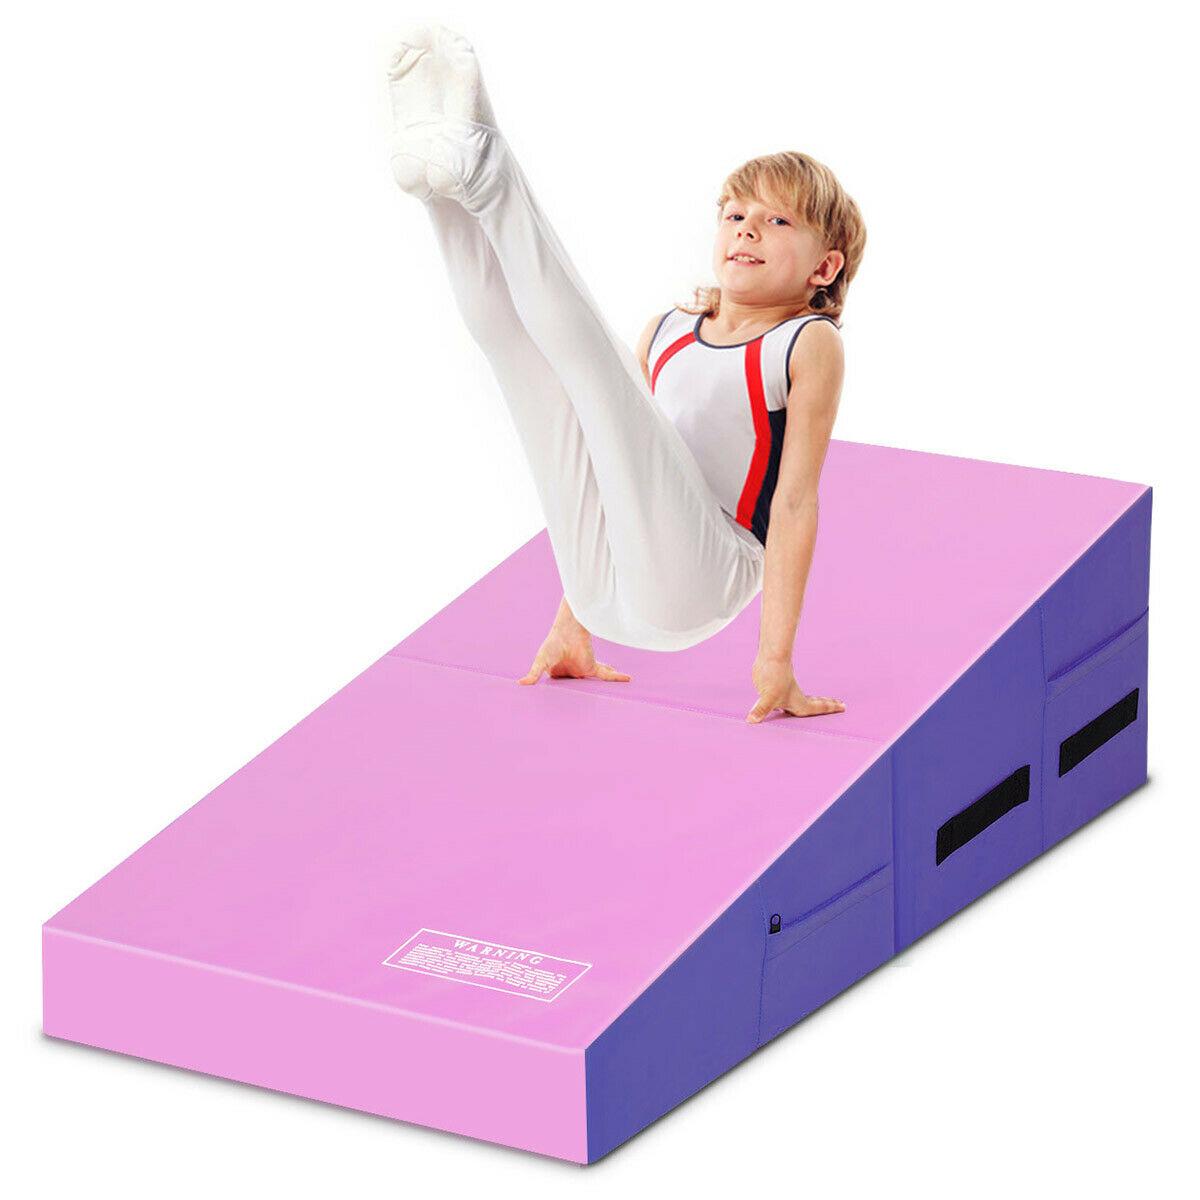 Folding Wedge Exercise Gymnastics Mat with Handles